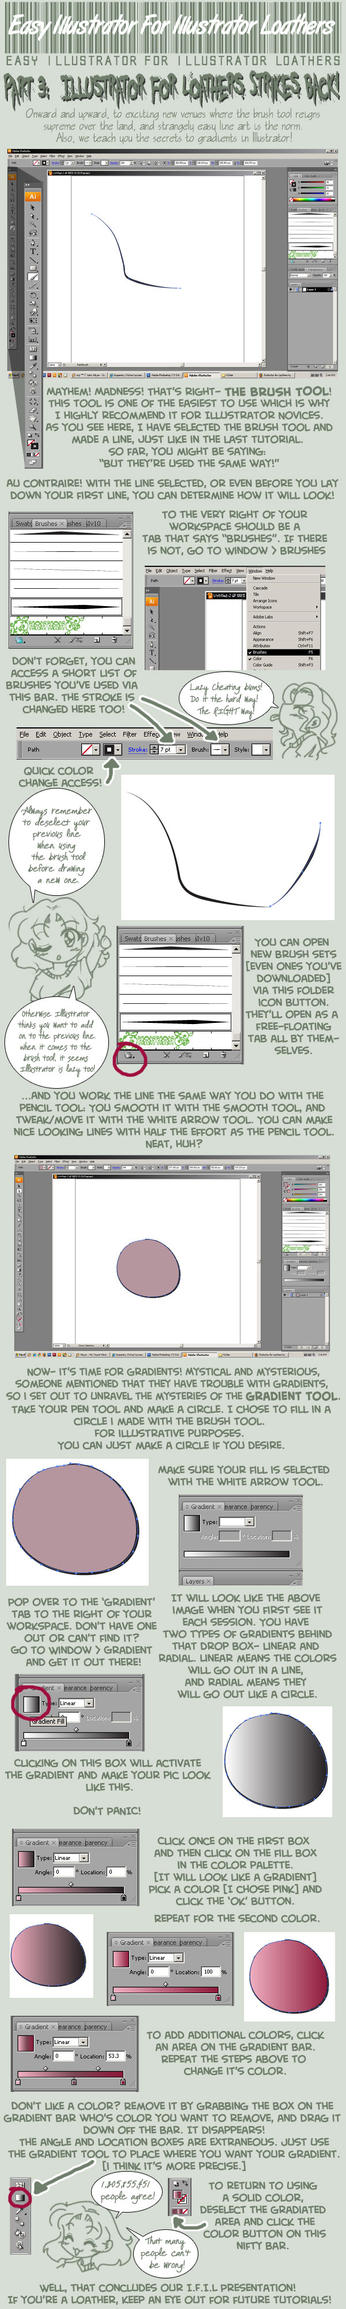 Illustrator for Loathers Pt.3 by yanagi-san